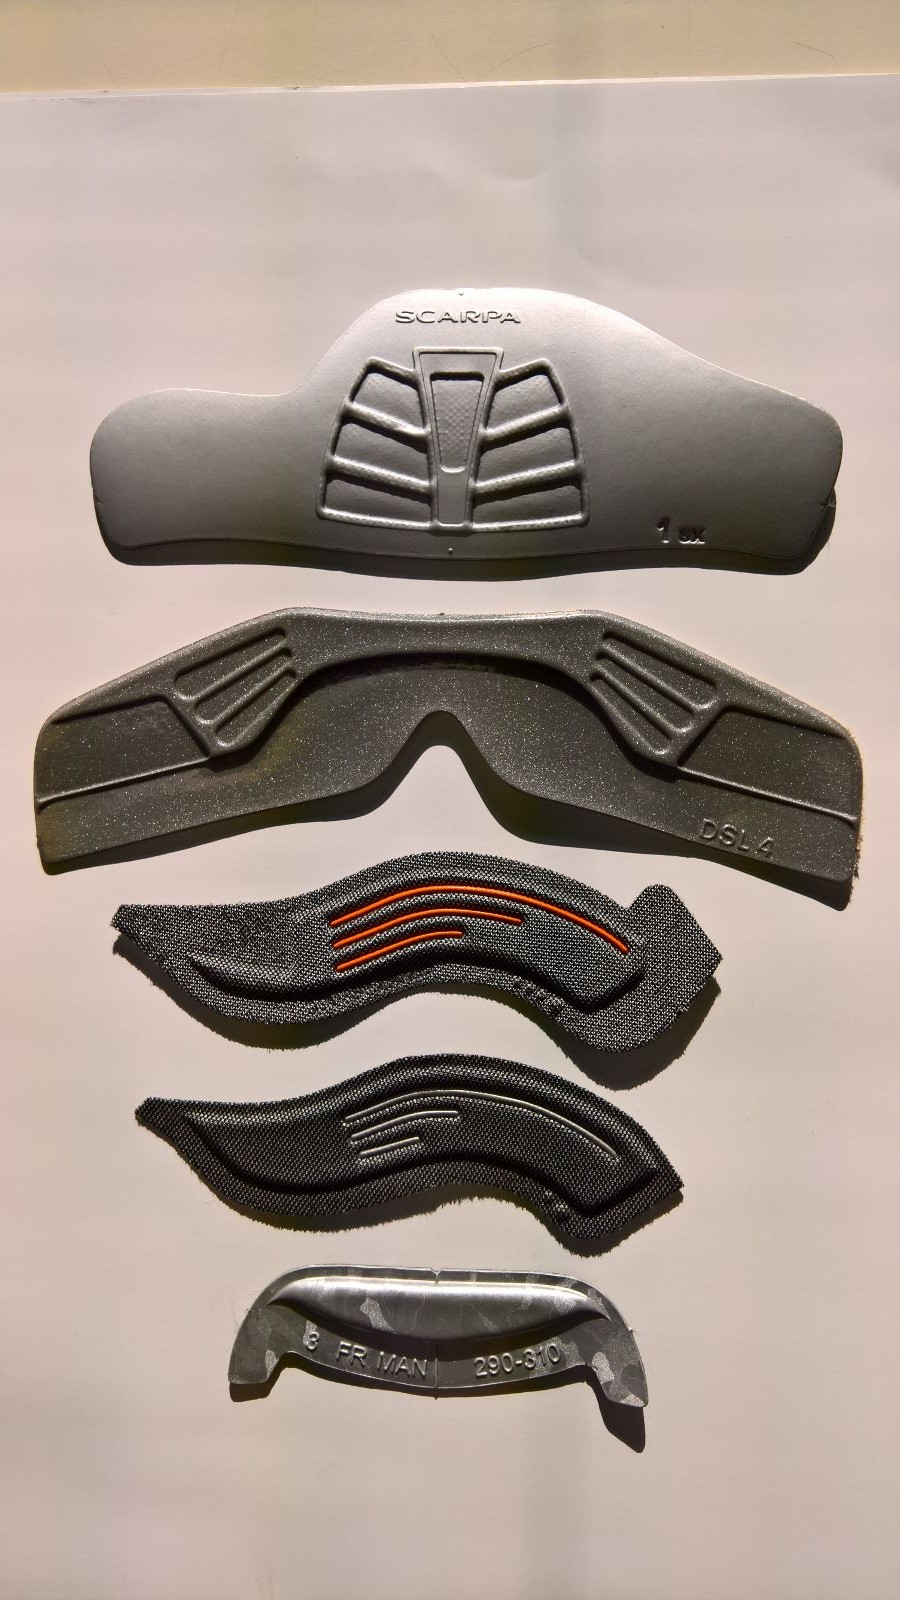 Termoformature scarponi da sci Teamform